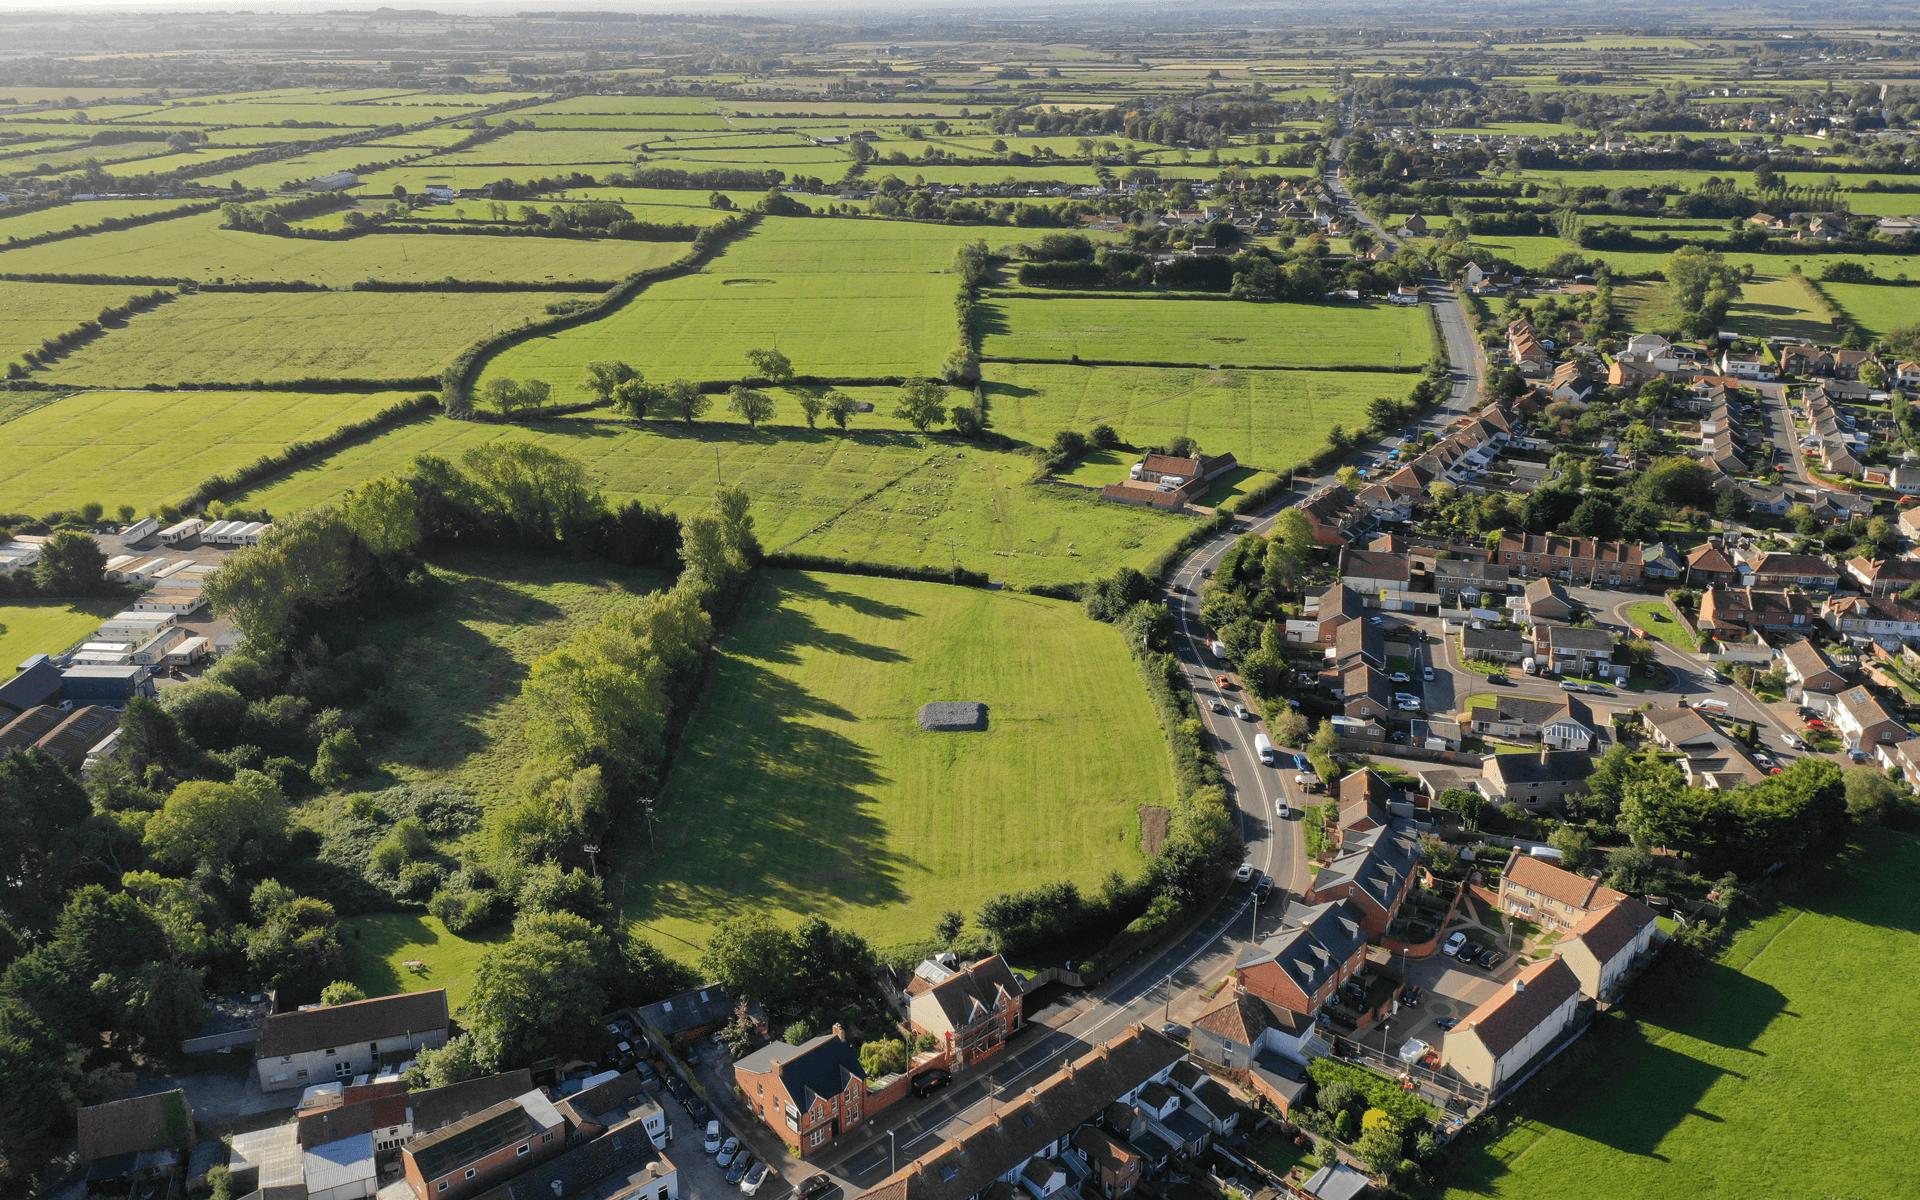 """Mavic 2 Pro"" aerial drone photo of a ""Barratt Homes"" development site in Alstone, Highbridge"